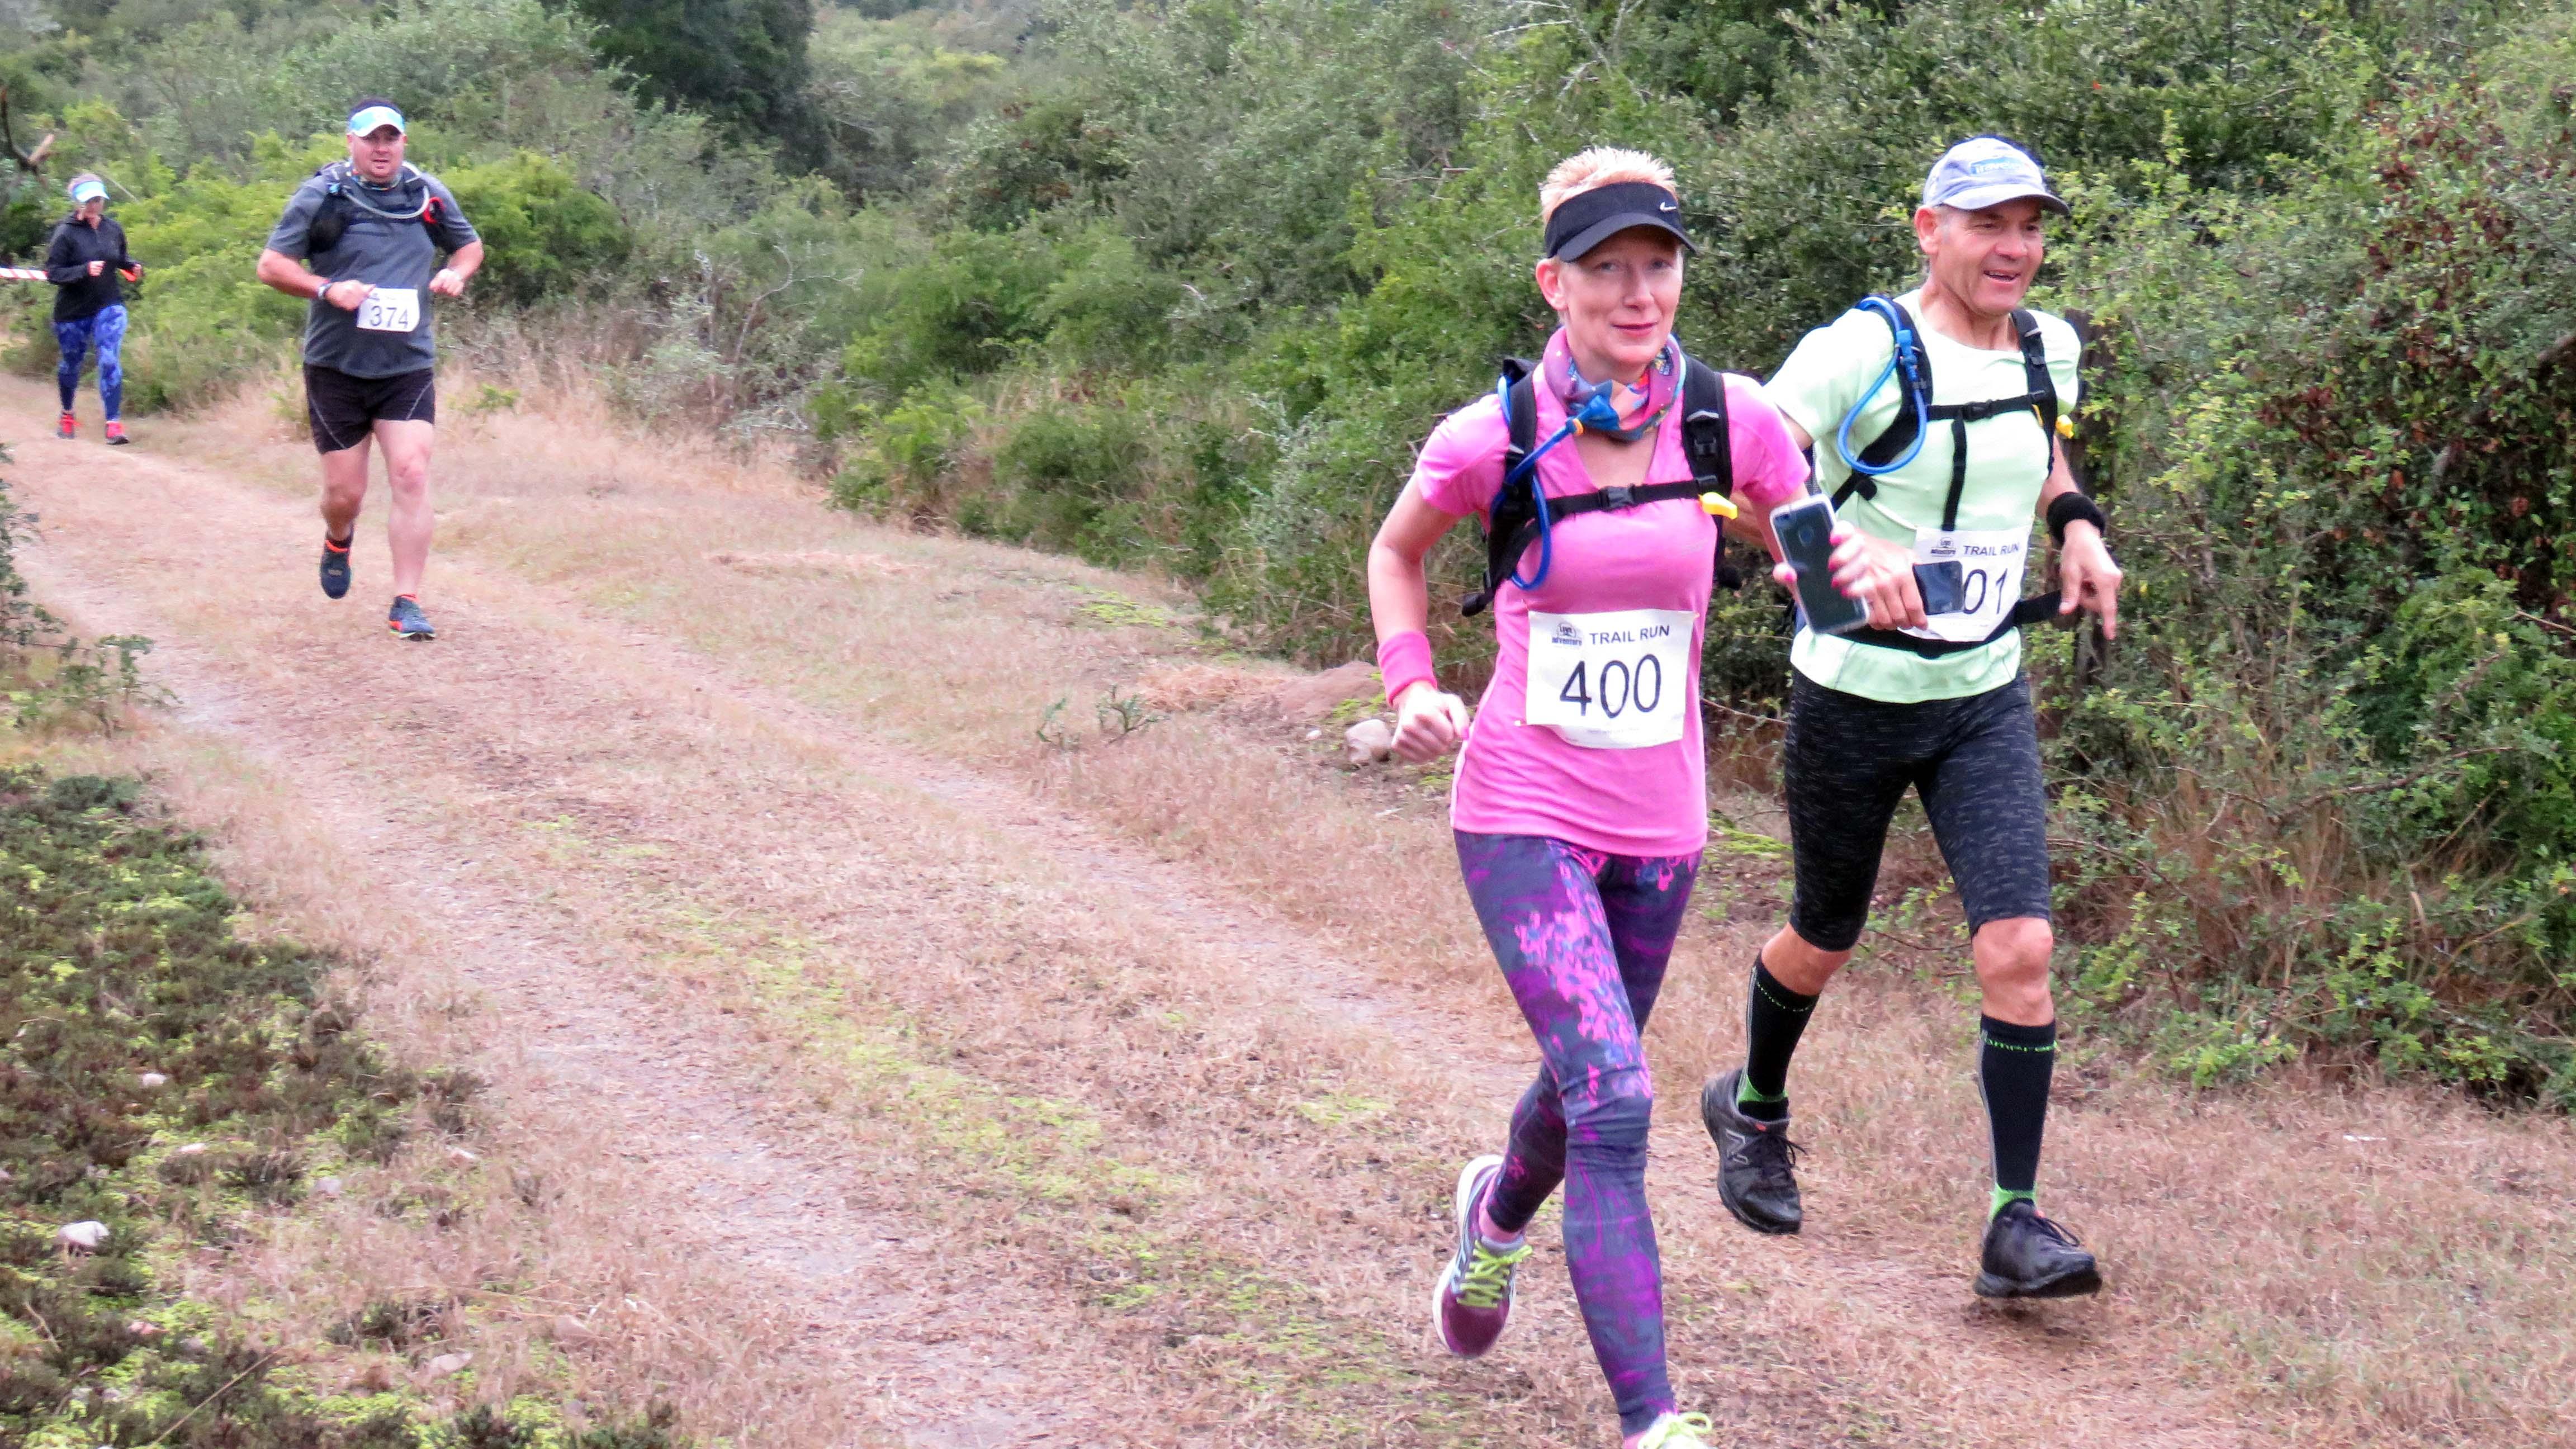 hayterdale trailrun 2018-08-05  (30)